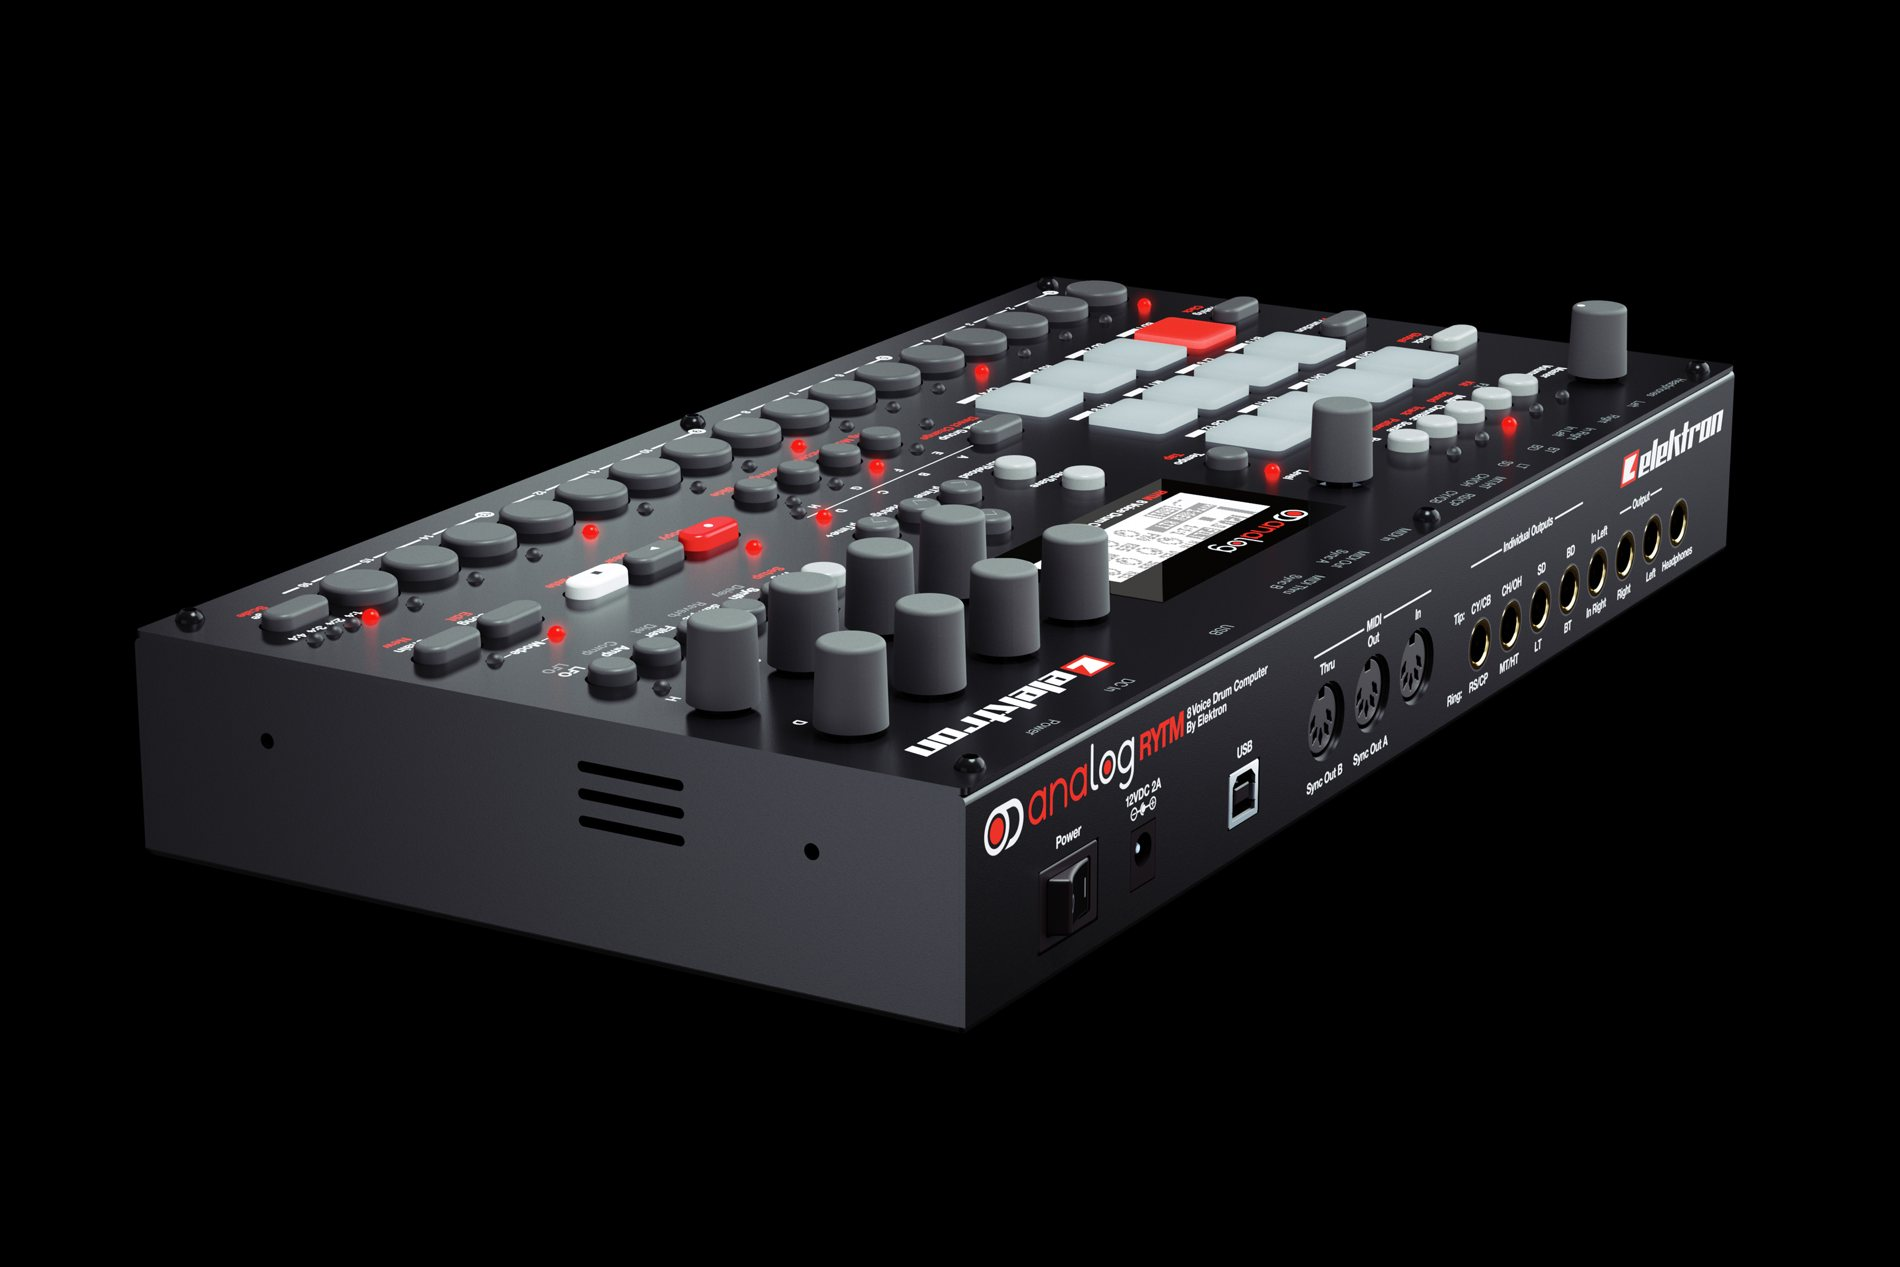 elektron analog rytm drum machine specs pricing photos cdm create digital music. Black Bedroom Furniture Sets. Home Design Ideas